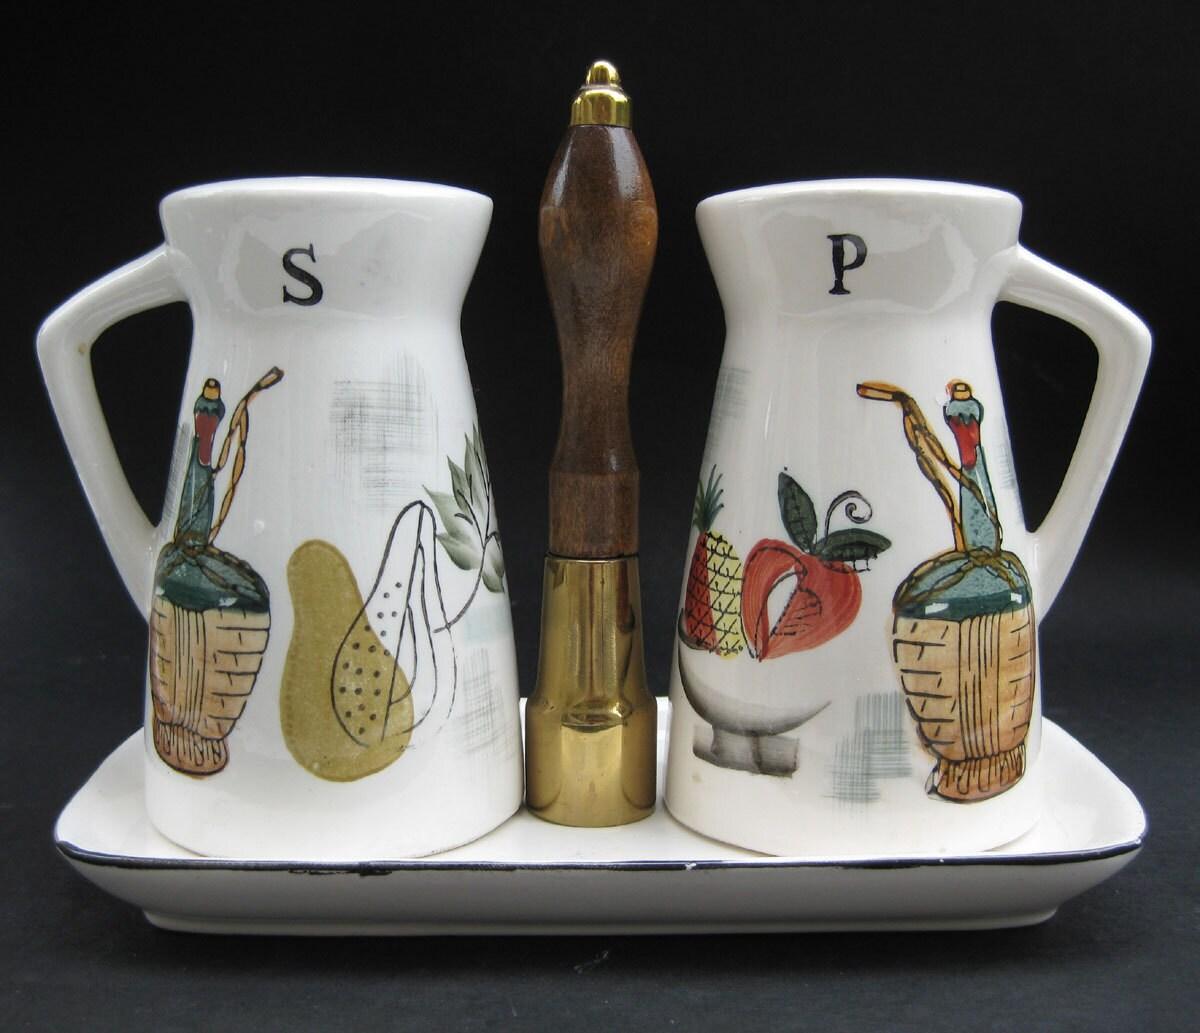 Eames Vintage 50s Salt Pepper Shaker Set By Aquamarinedream